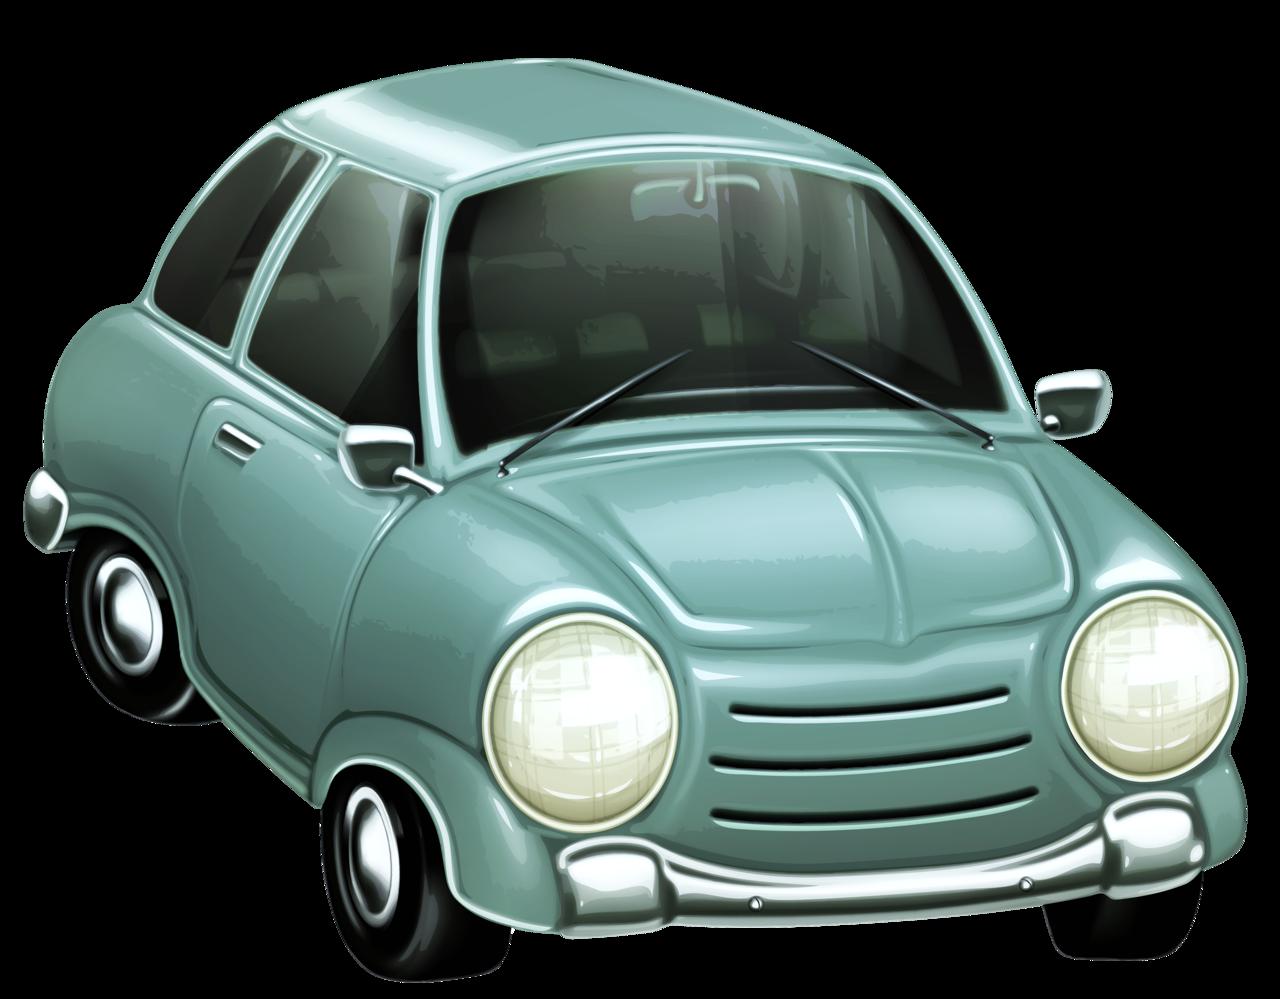 Free vintage car clipart image freeuse Mini Clipart cute car - Free Clipart on Dumielauxepices.net image freeuse